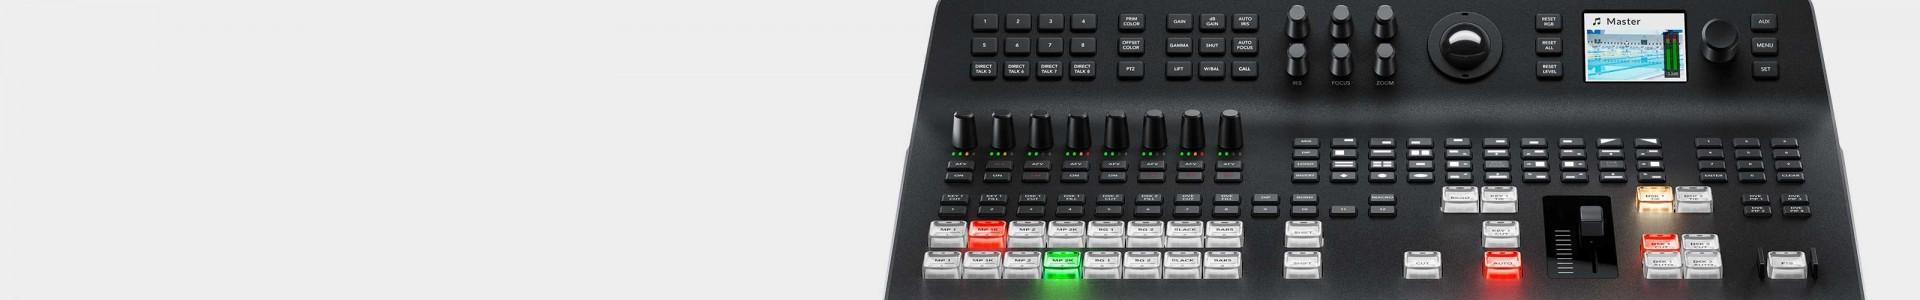 Mezcladores Vídeo Blackmagic - Avacab distribuidor oficial